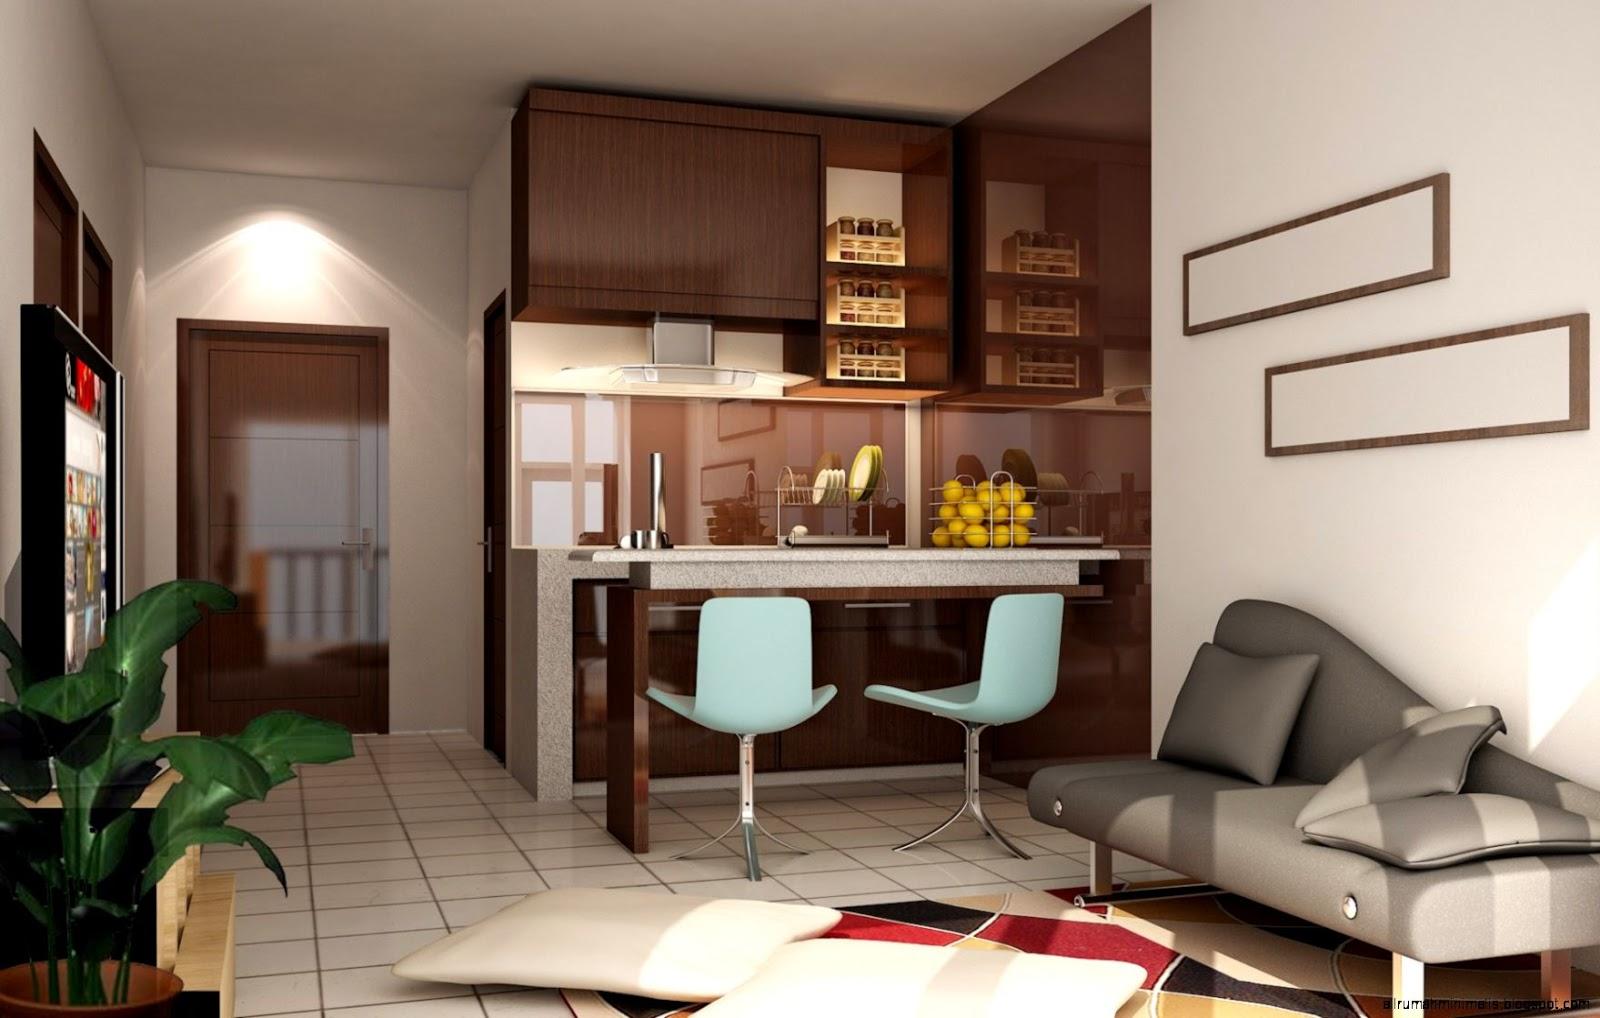 Desain Ruang Keluarga Yang Menyatu Dengan Dapur Denah Rumah